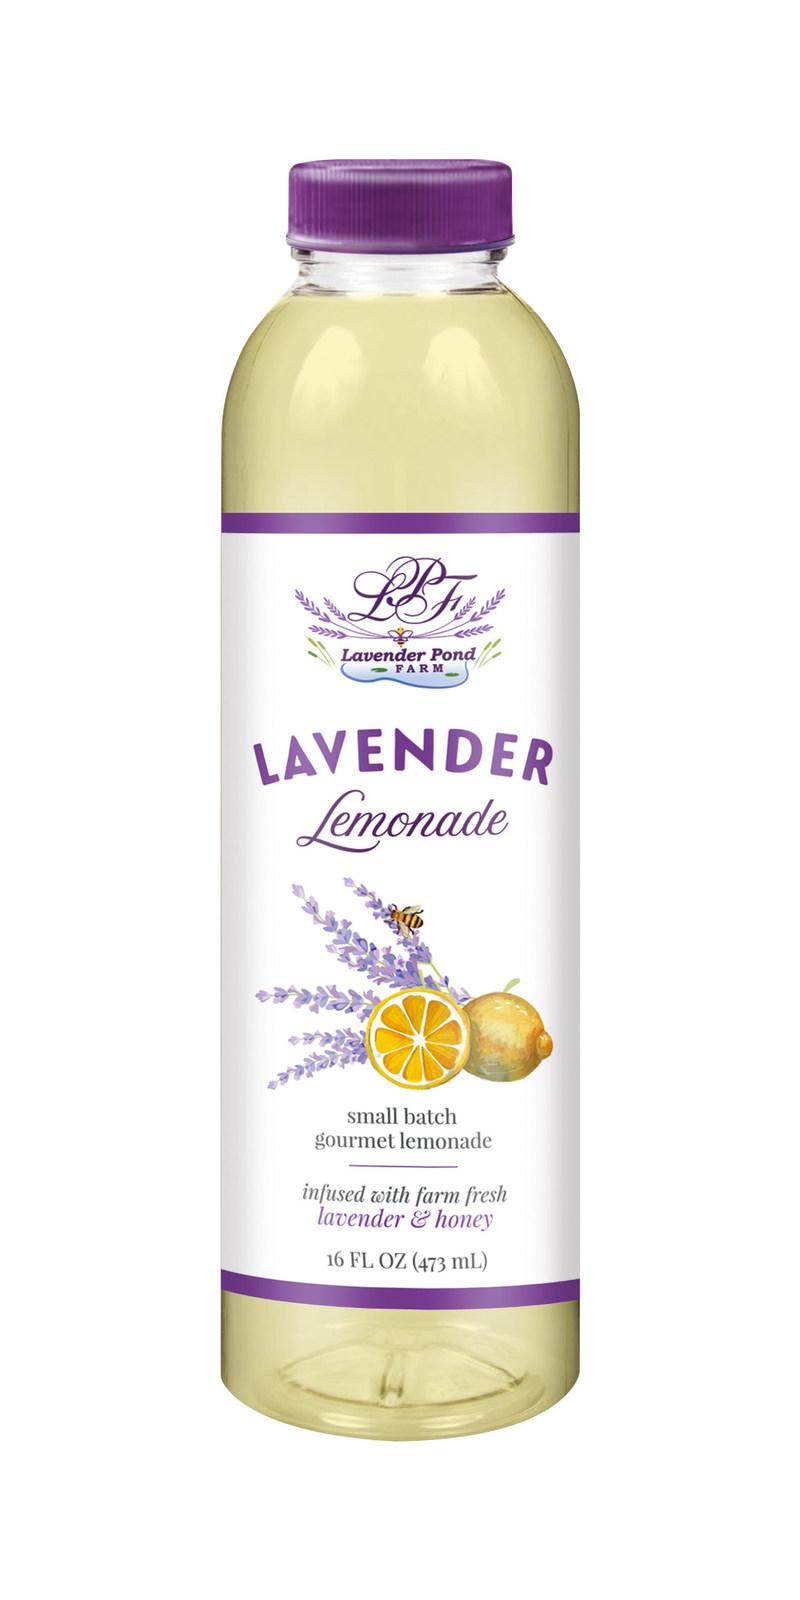 Lavender Lemonade from Lavender Pond Farm